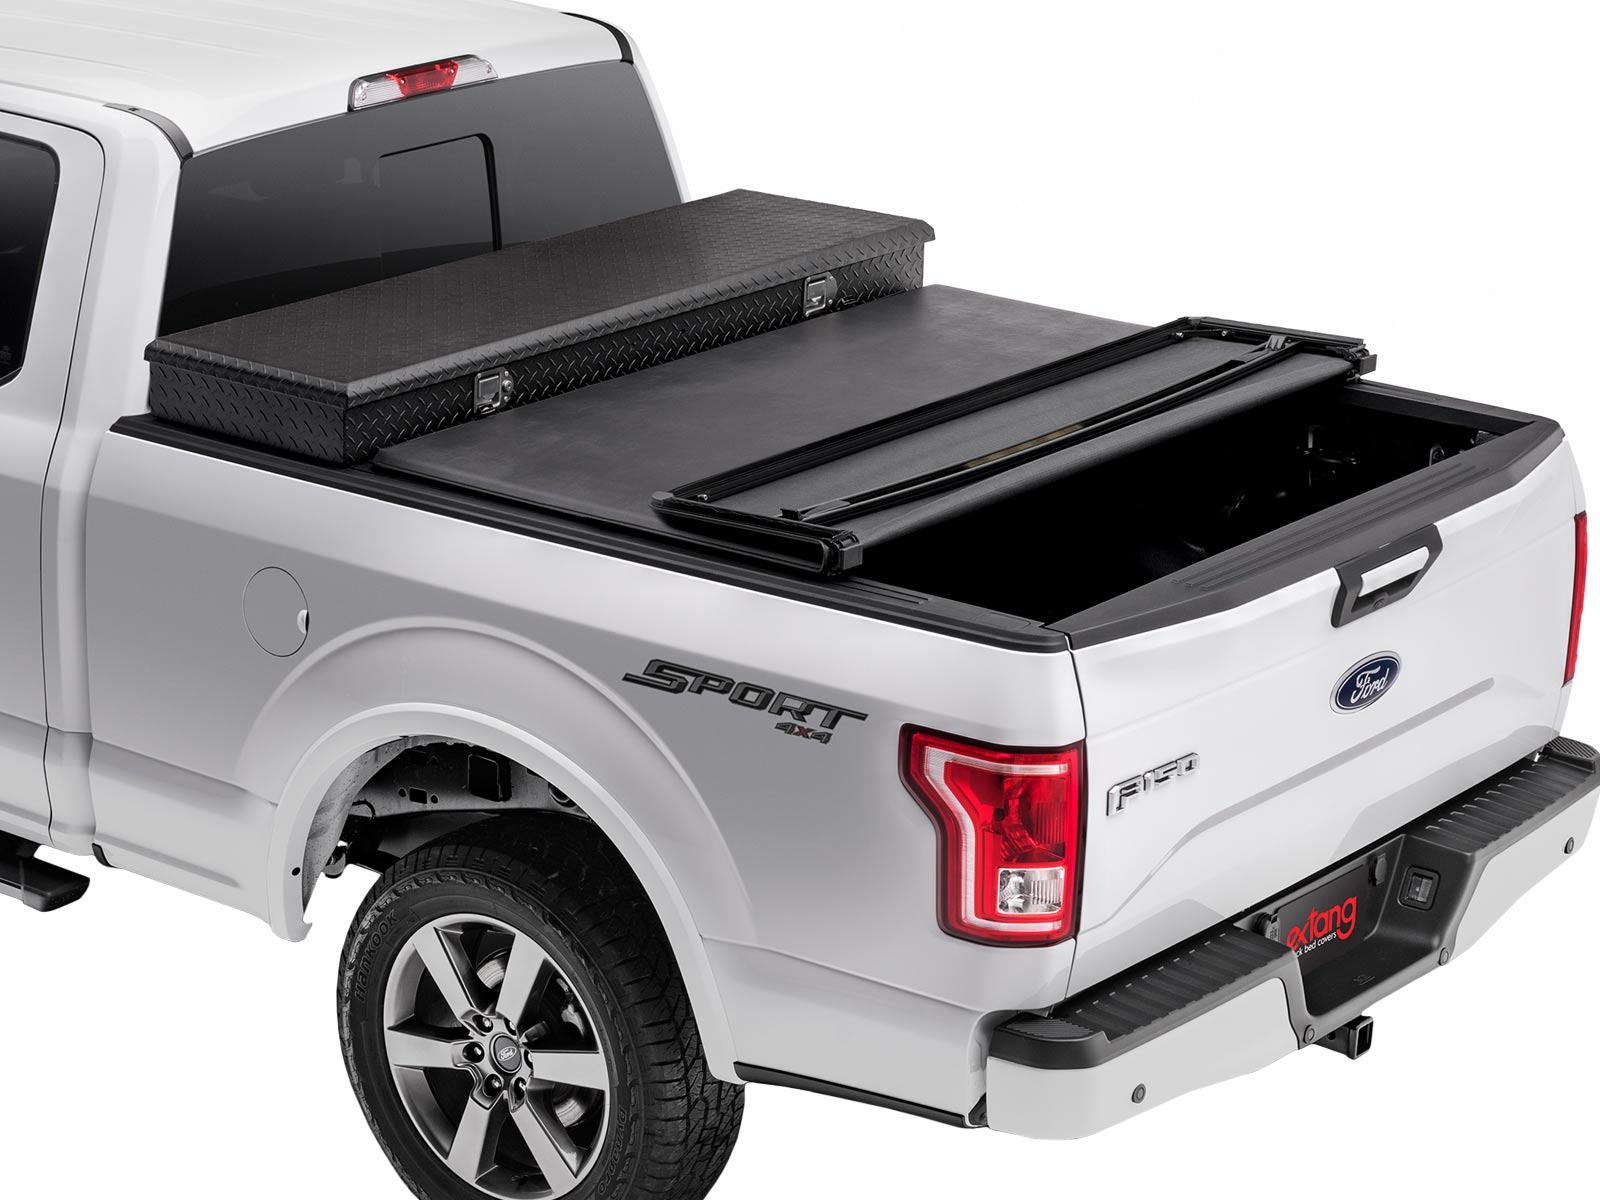 Dodge Ram 3500 Tool Box Realtruck